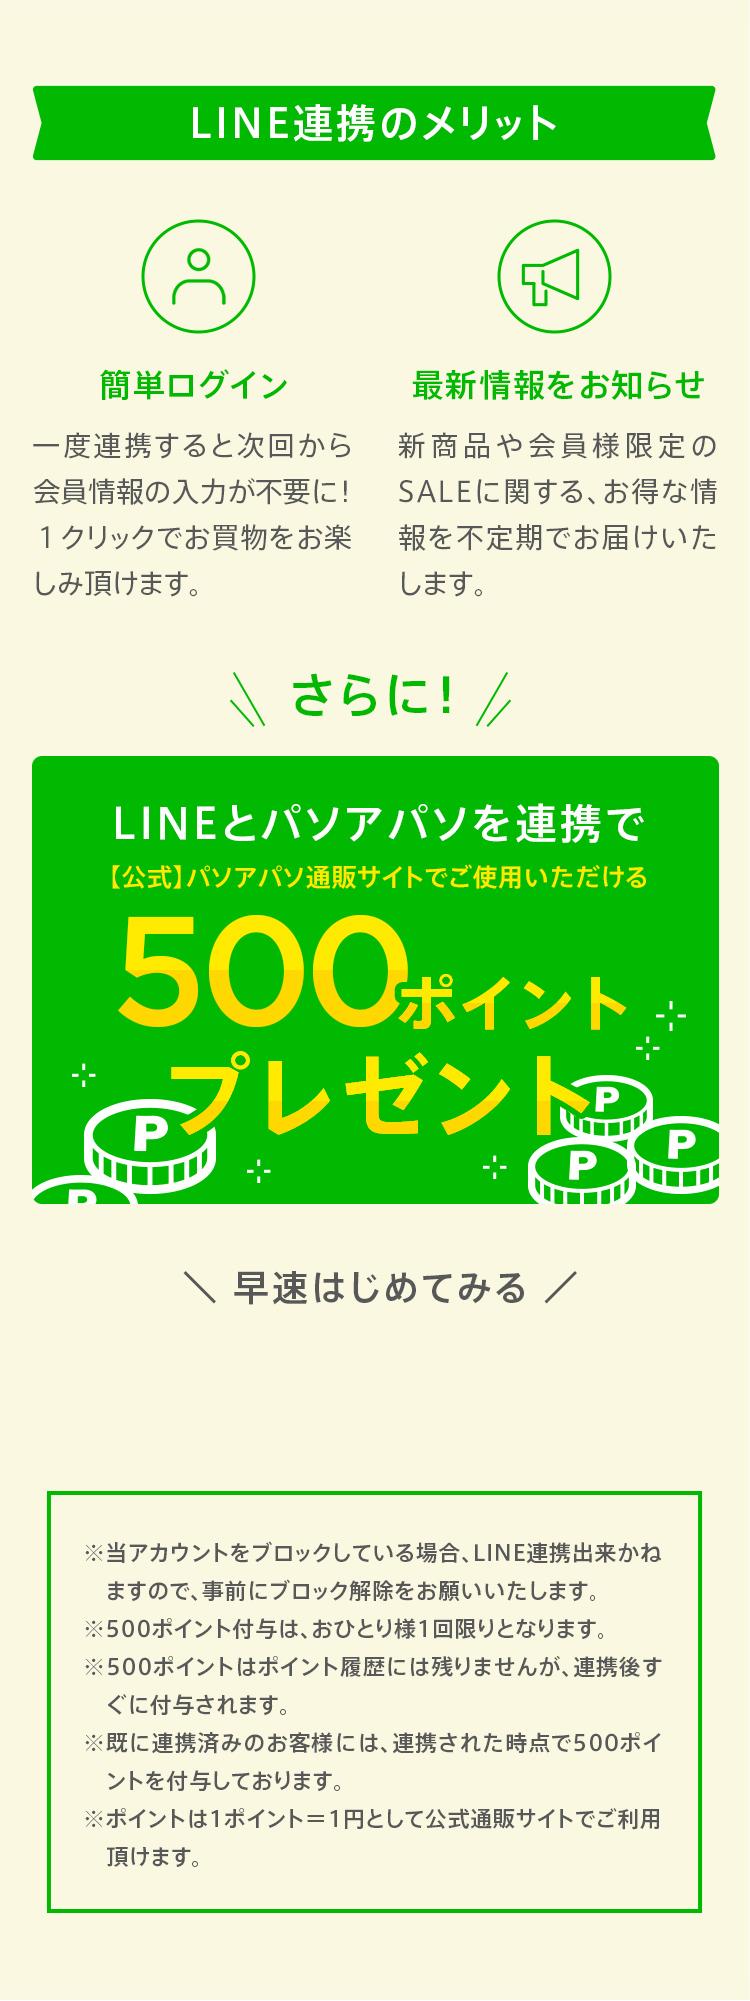 LINE ID連携のメリット